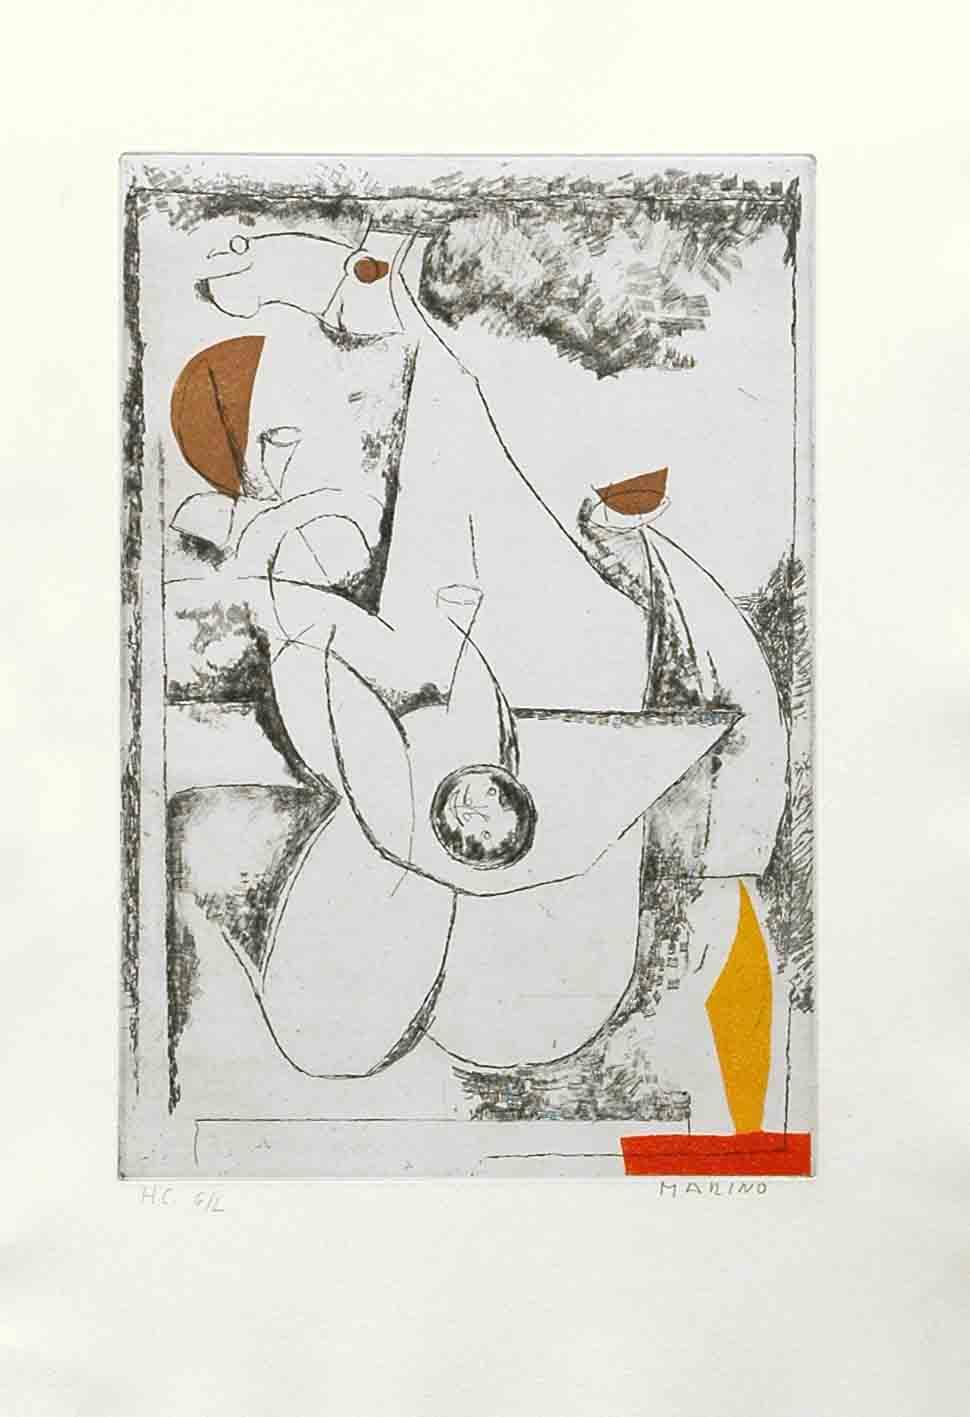 alt Miracolo, from Tout Pres de Marini, Plate IV, 1971